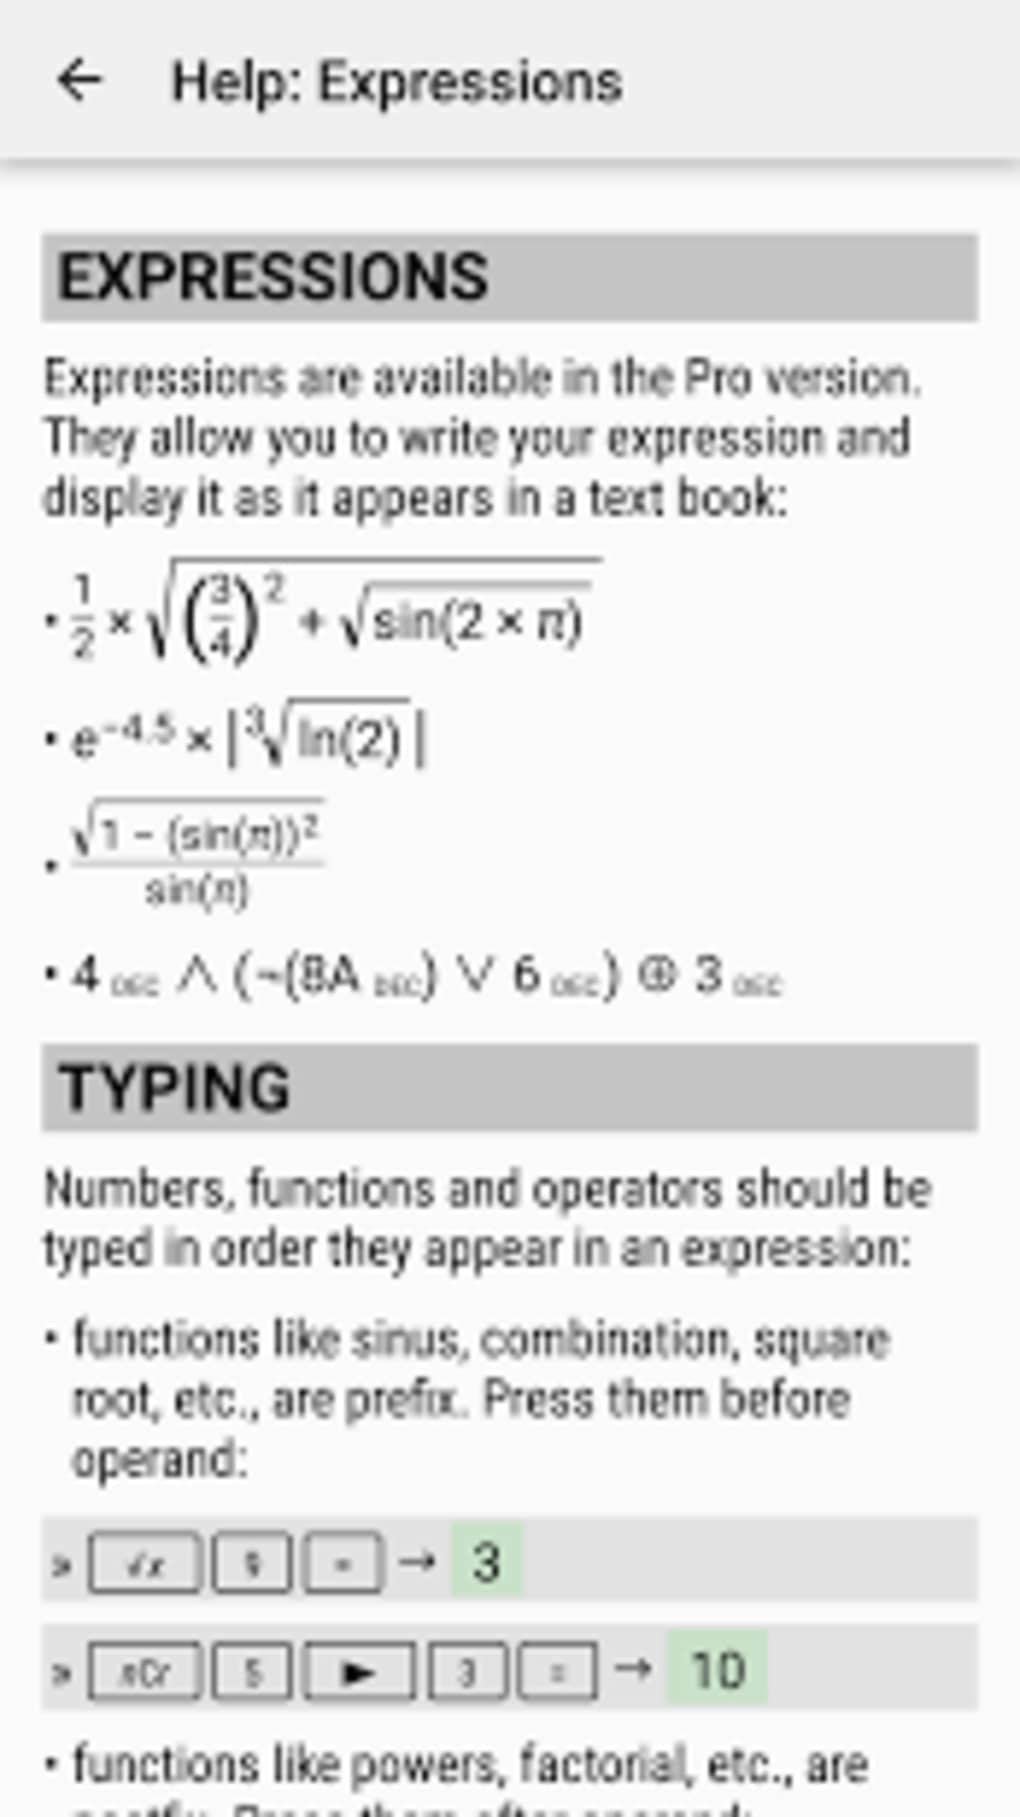 HiPER Scientific Calculator for Android - Download